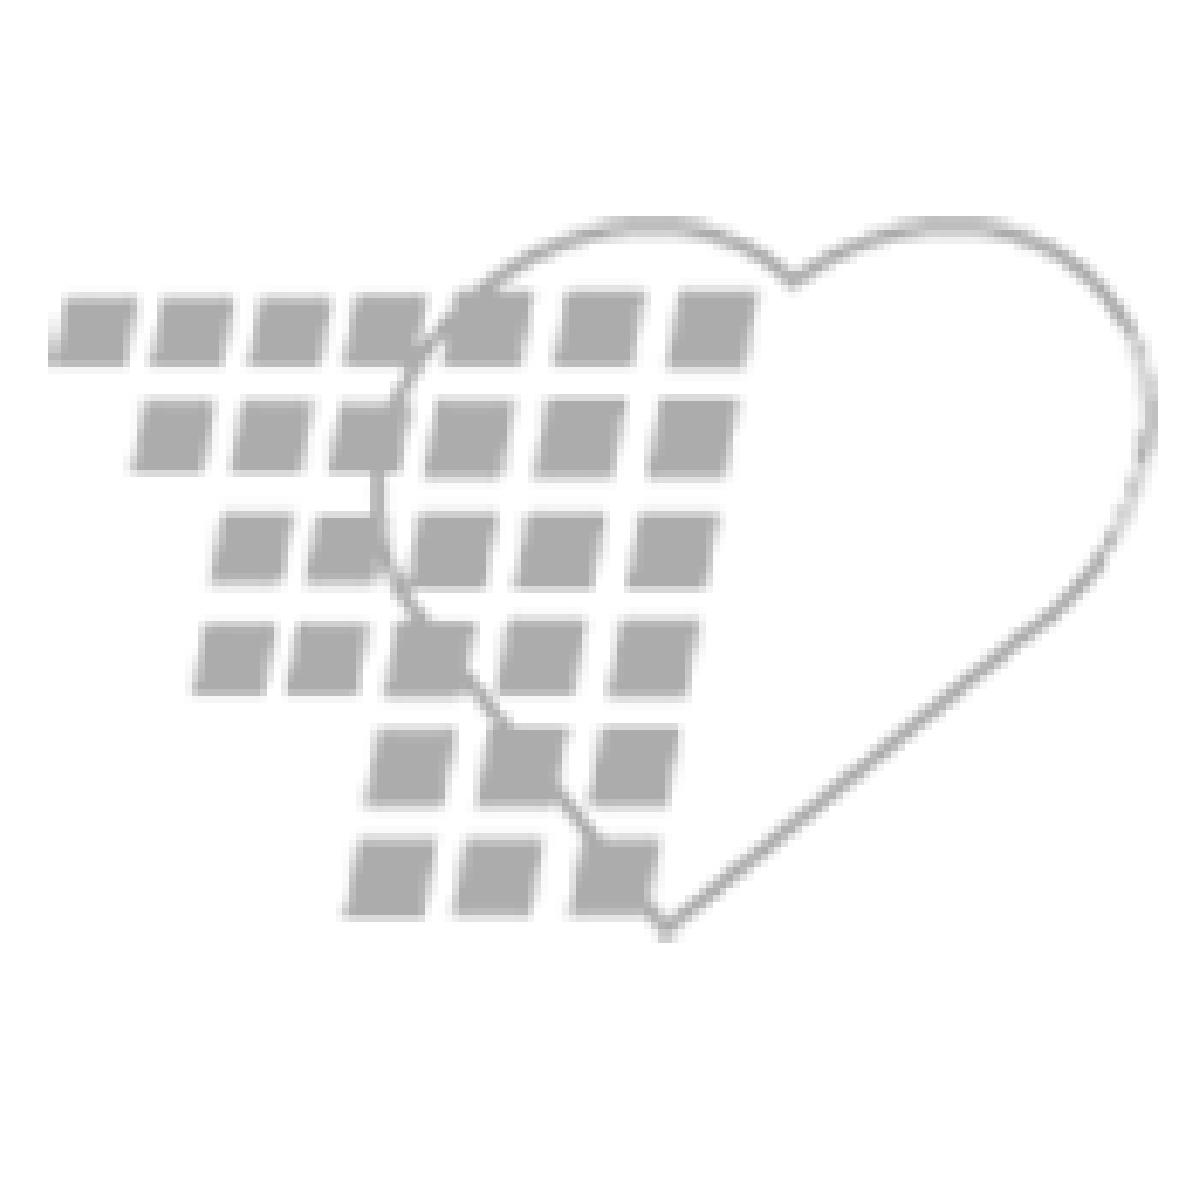 12-81-6051 Nasco Tan CPR Prompt® TPAK 50T Infant Training Pack - 5 Manikins